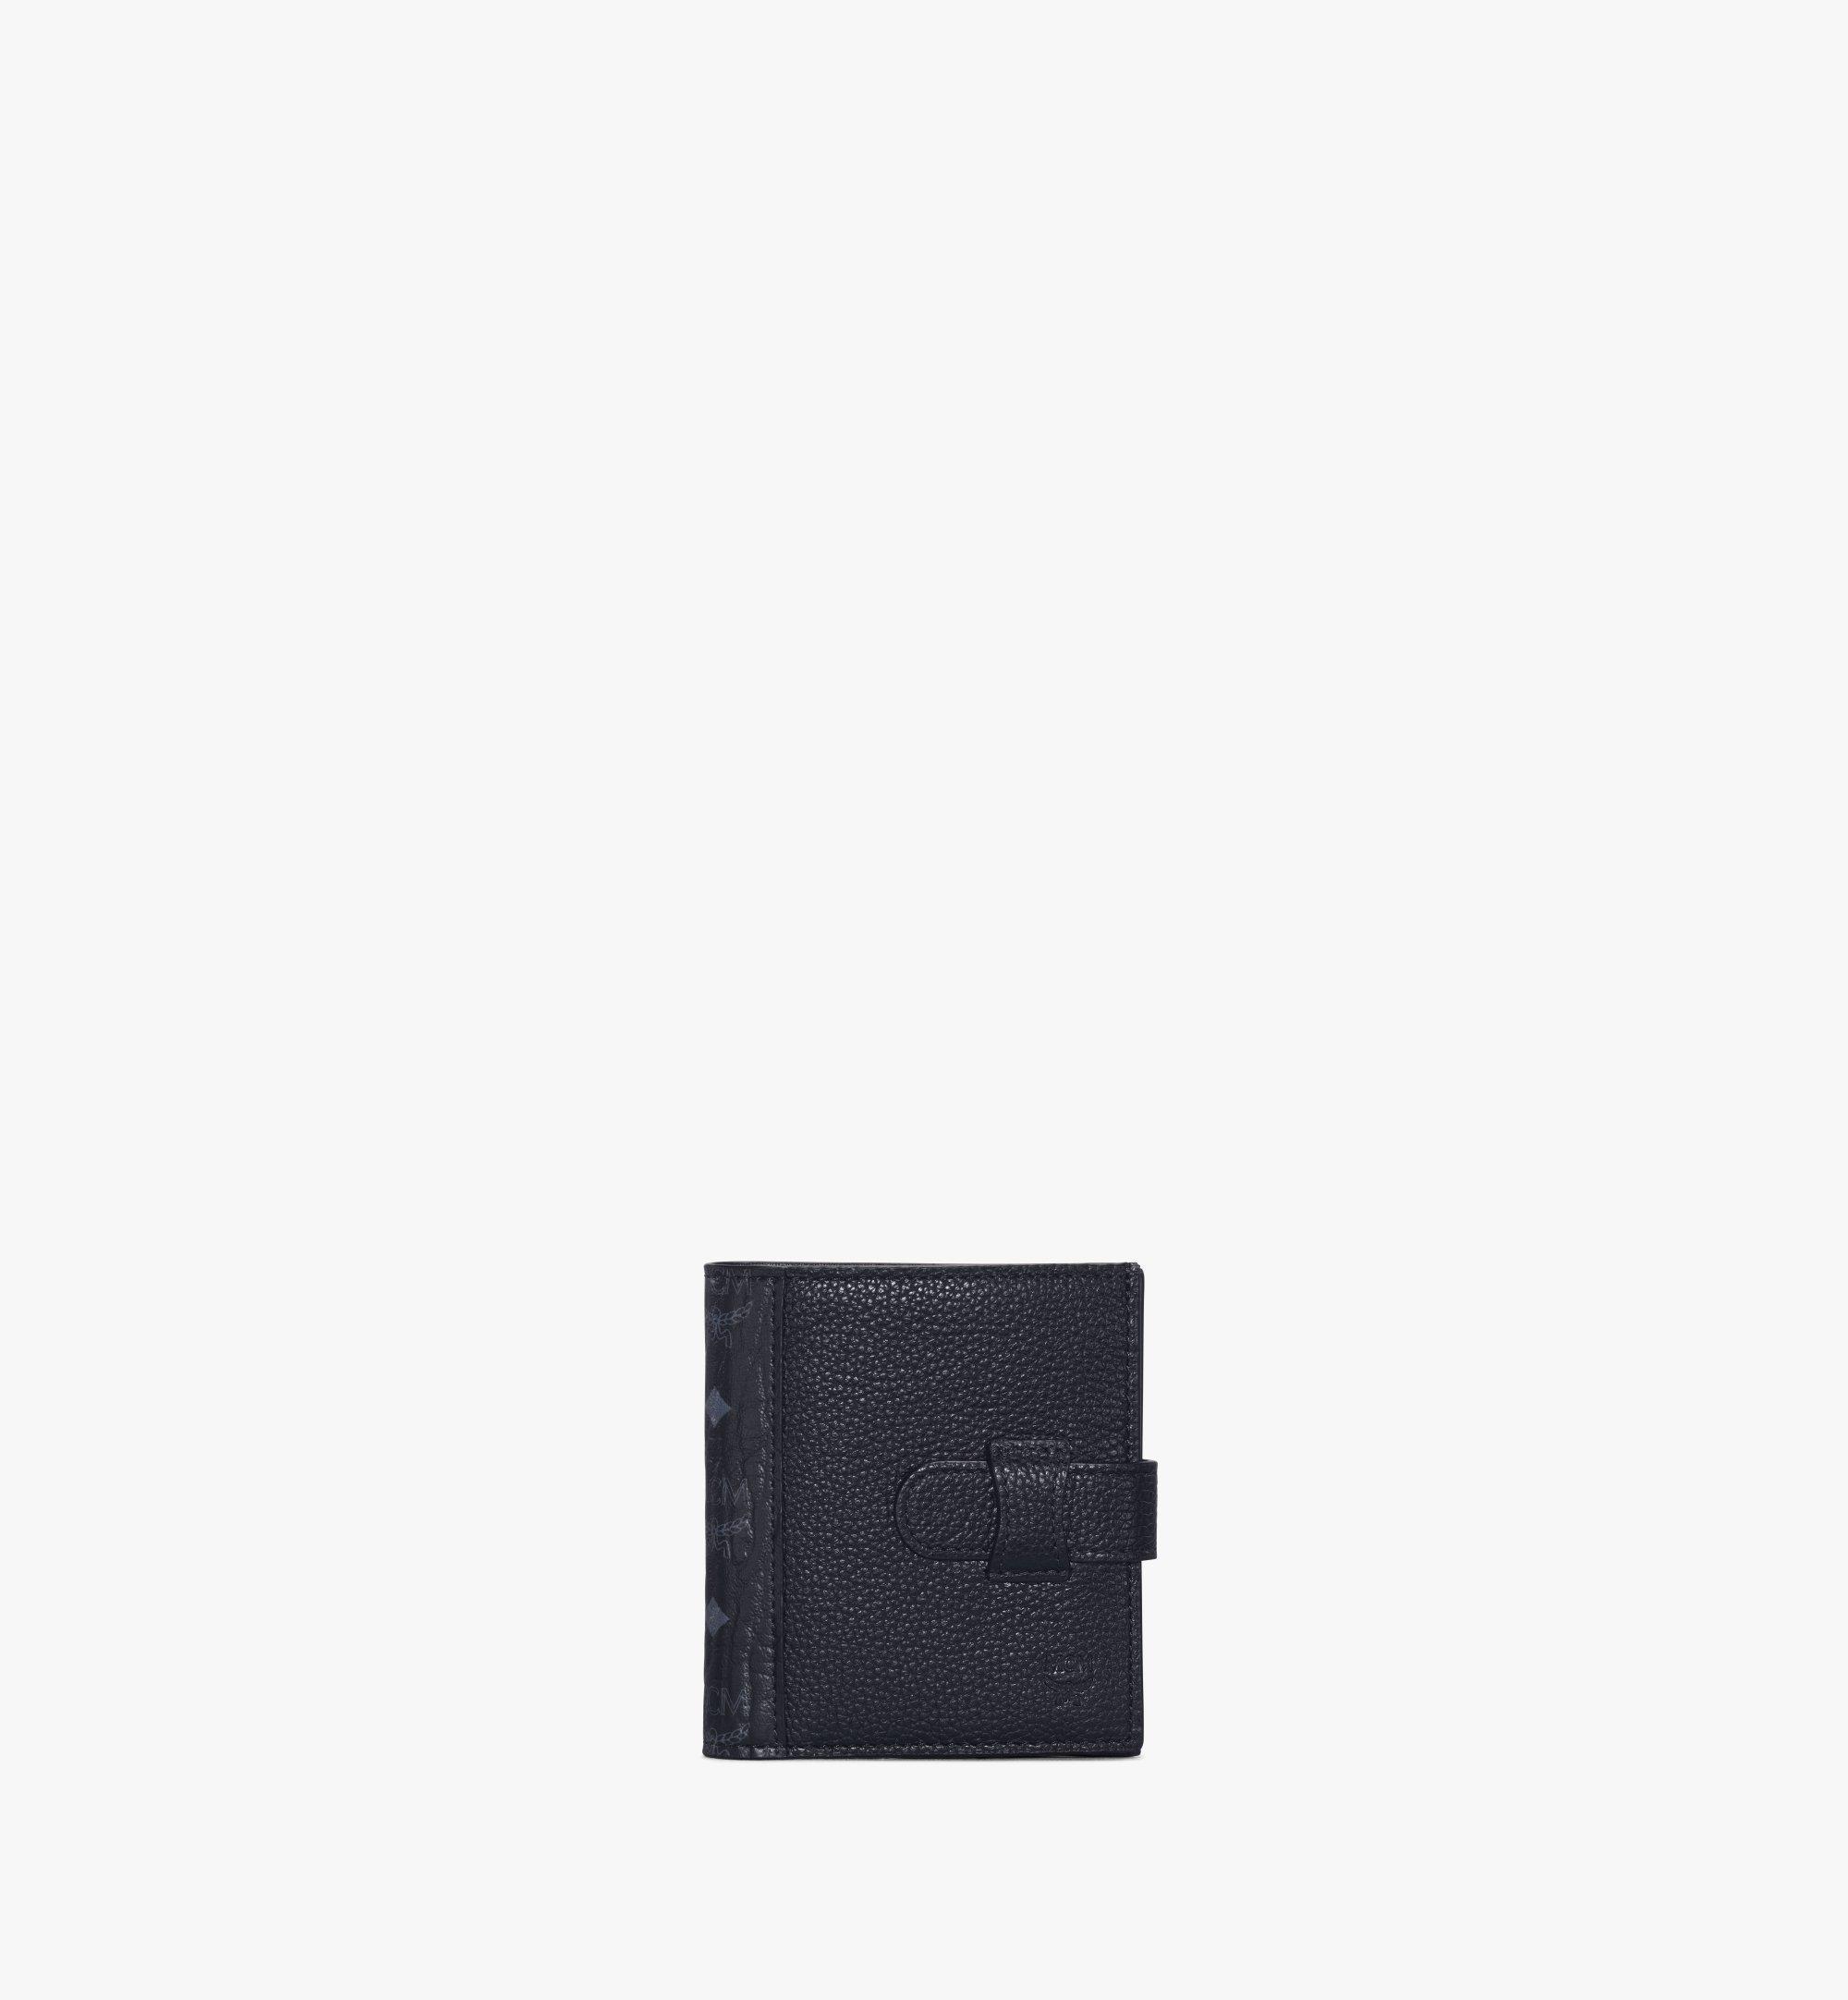 MCM 二つ折り カードウォレット - ヴィセトス レザー ミックス Black MXSAAVI08BK001 ほかの角度から見る 1